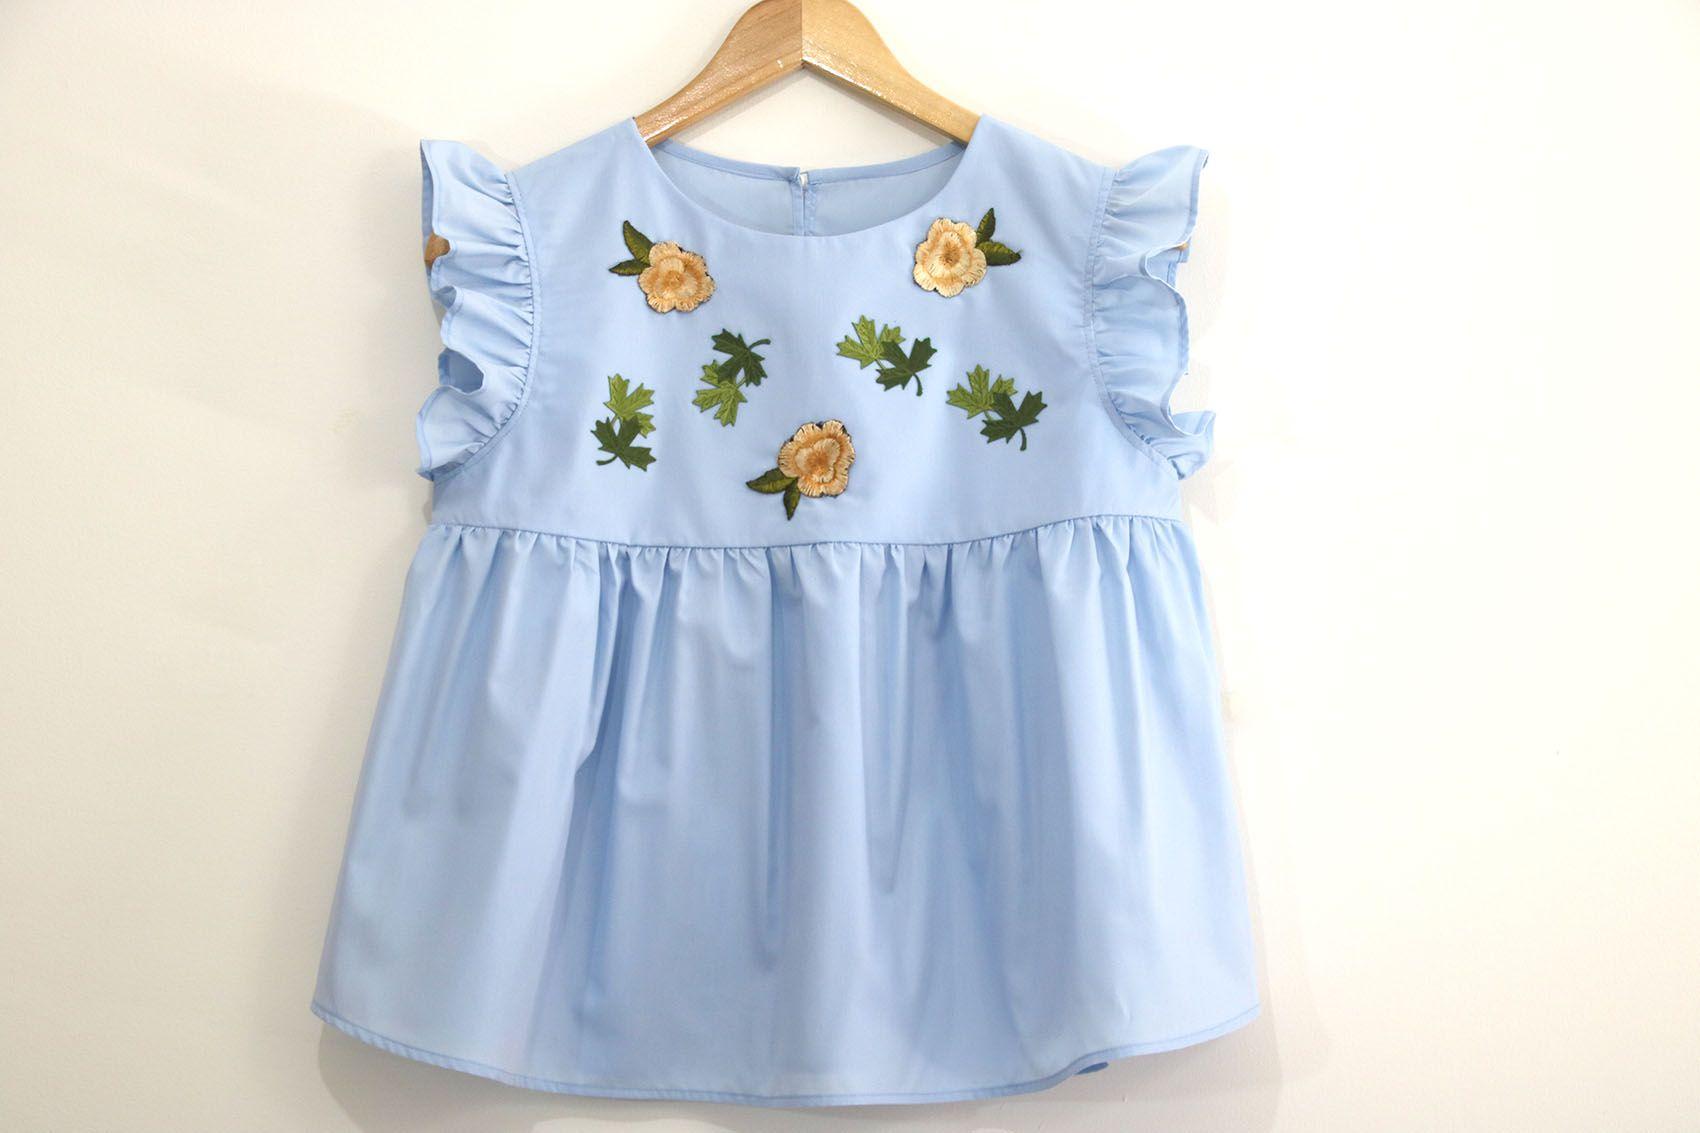 1293e703a Costura de ropa para mujer  Blusa bordada (patrones gratis)